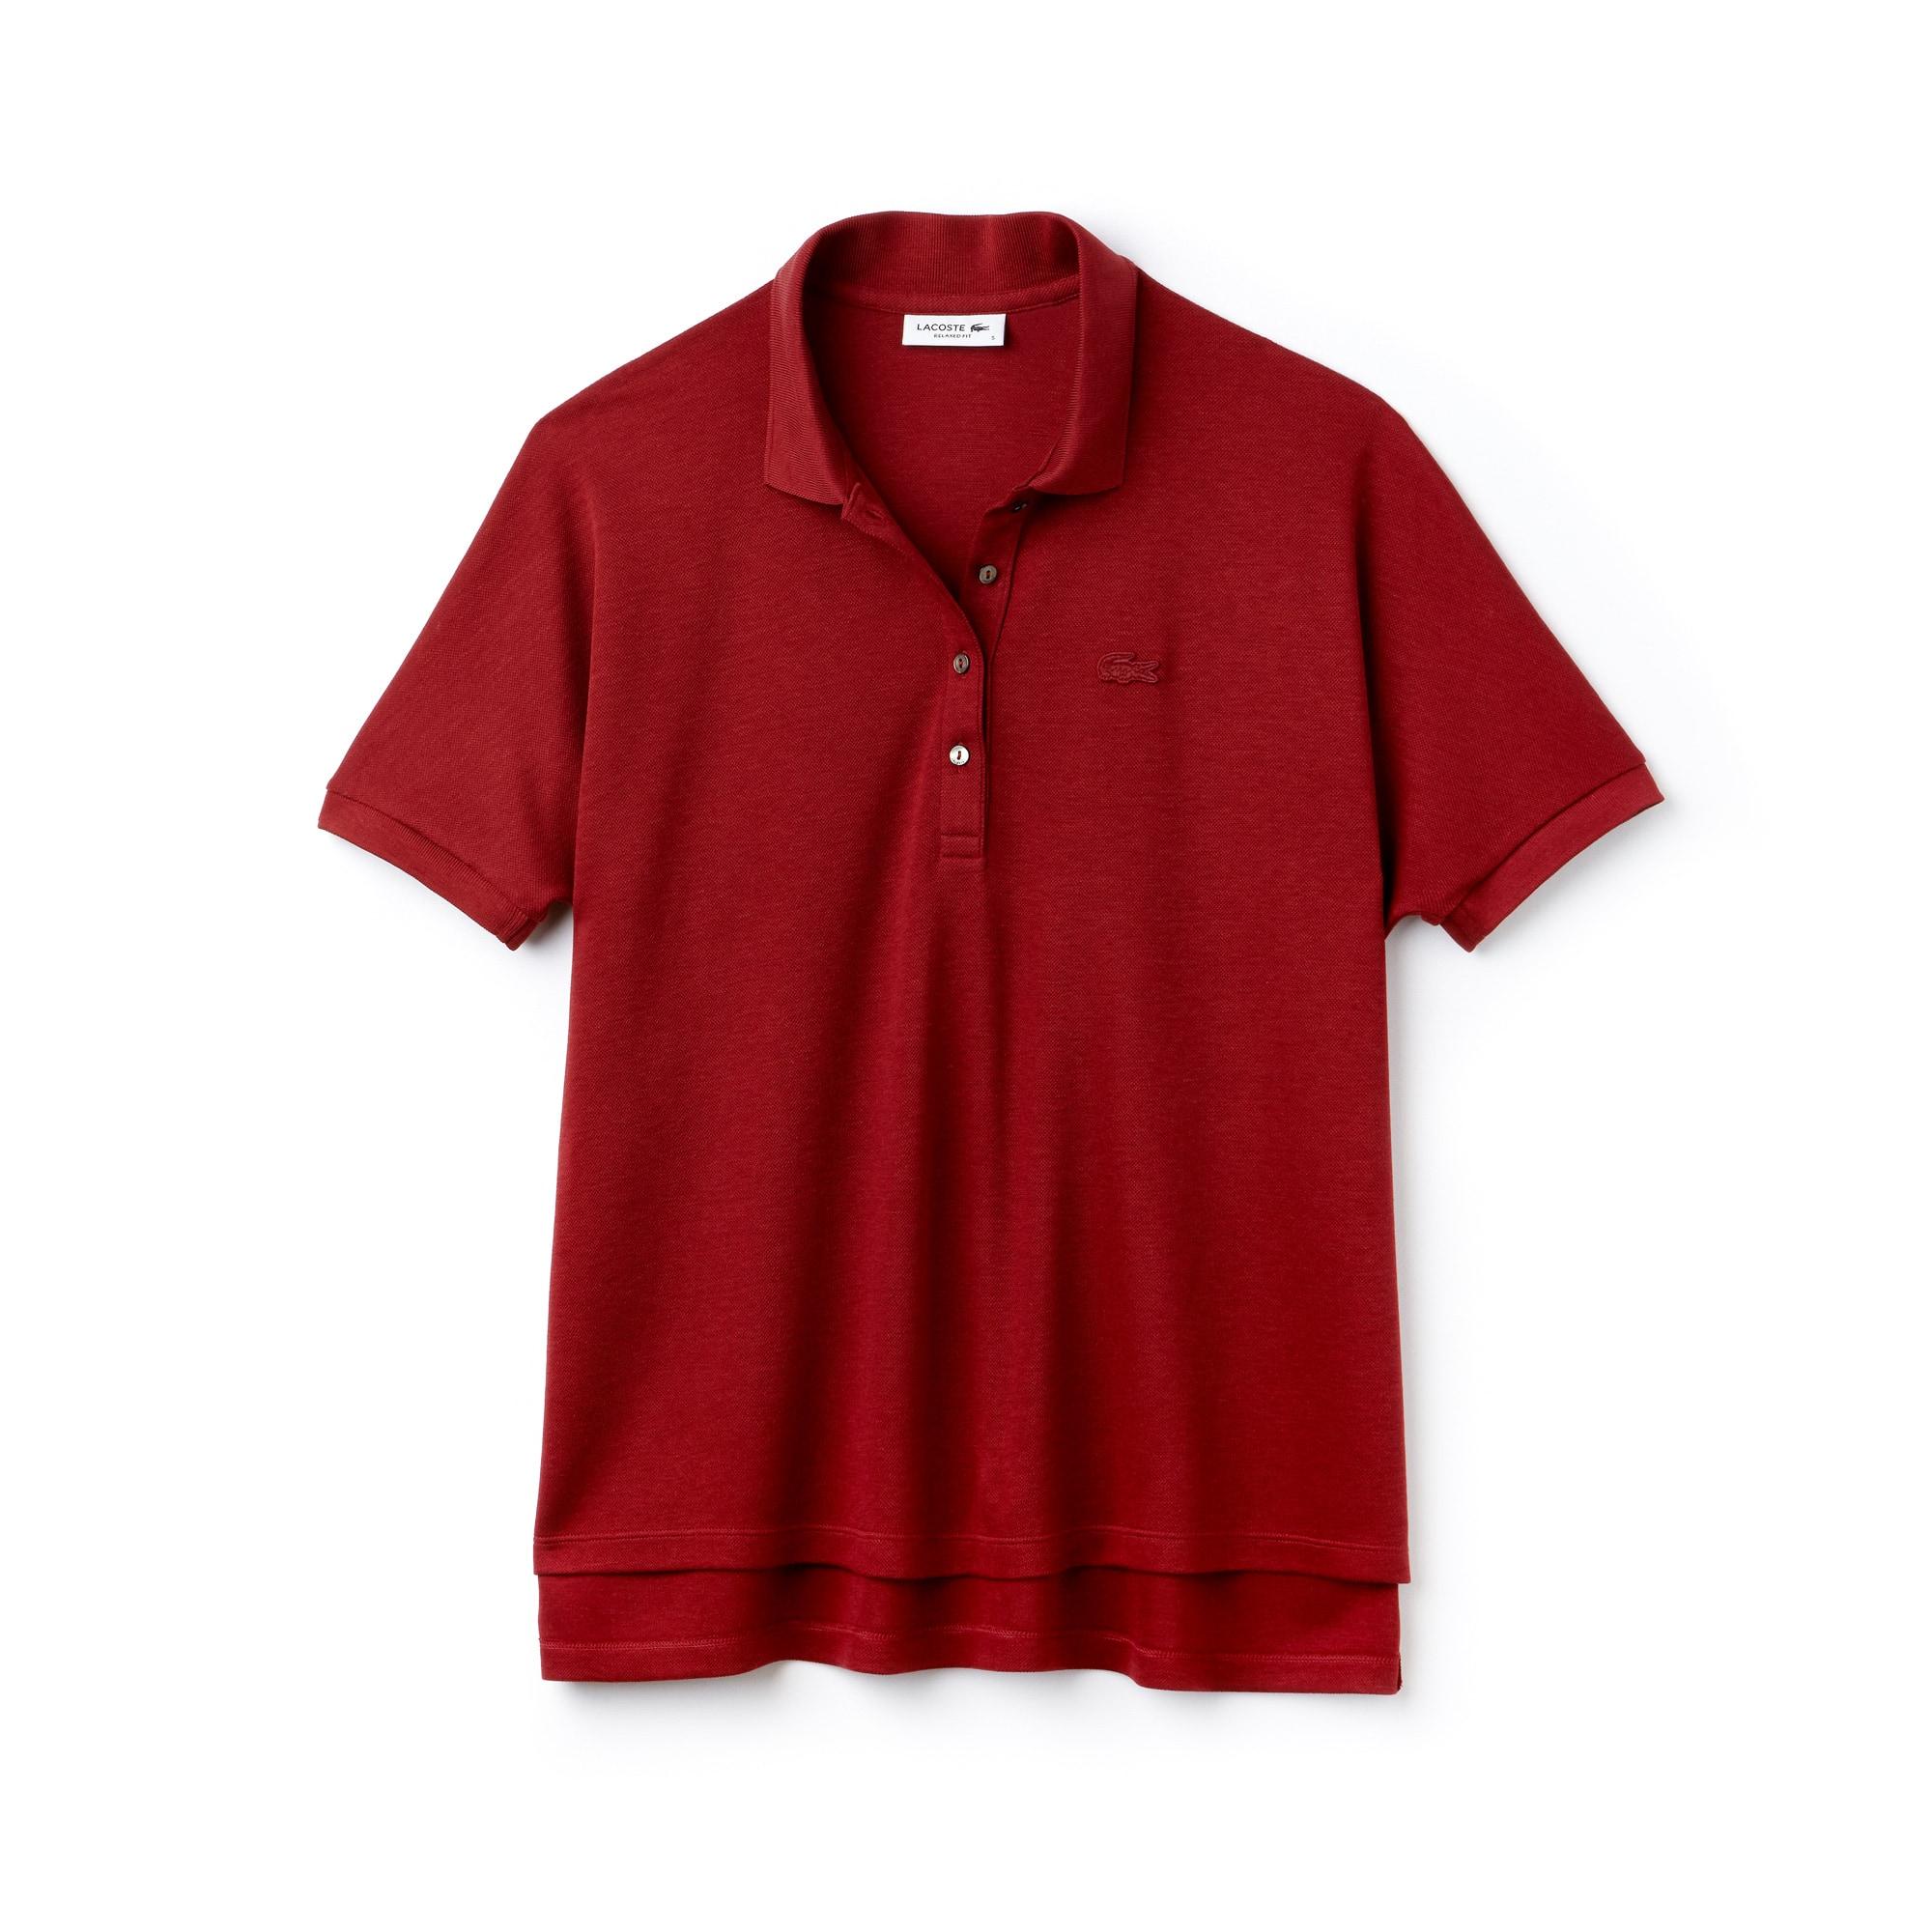 Women's Lacoste Boxy Fit Flowing Stretch Cotton Piqué Polo Shirt